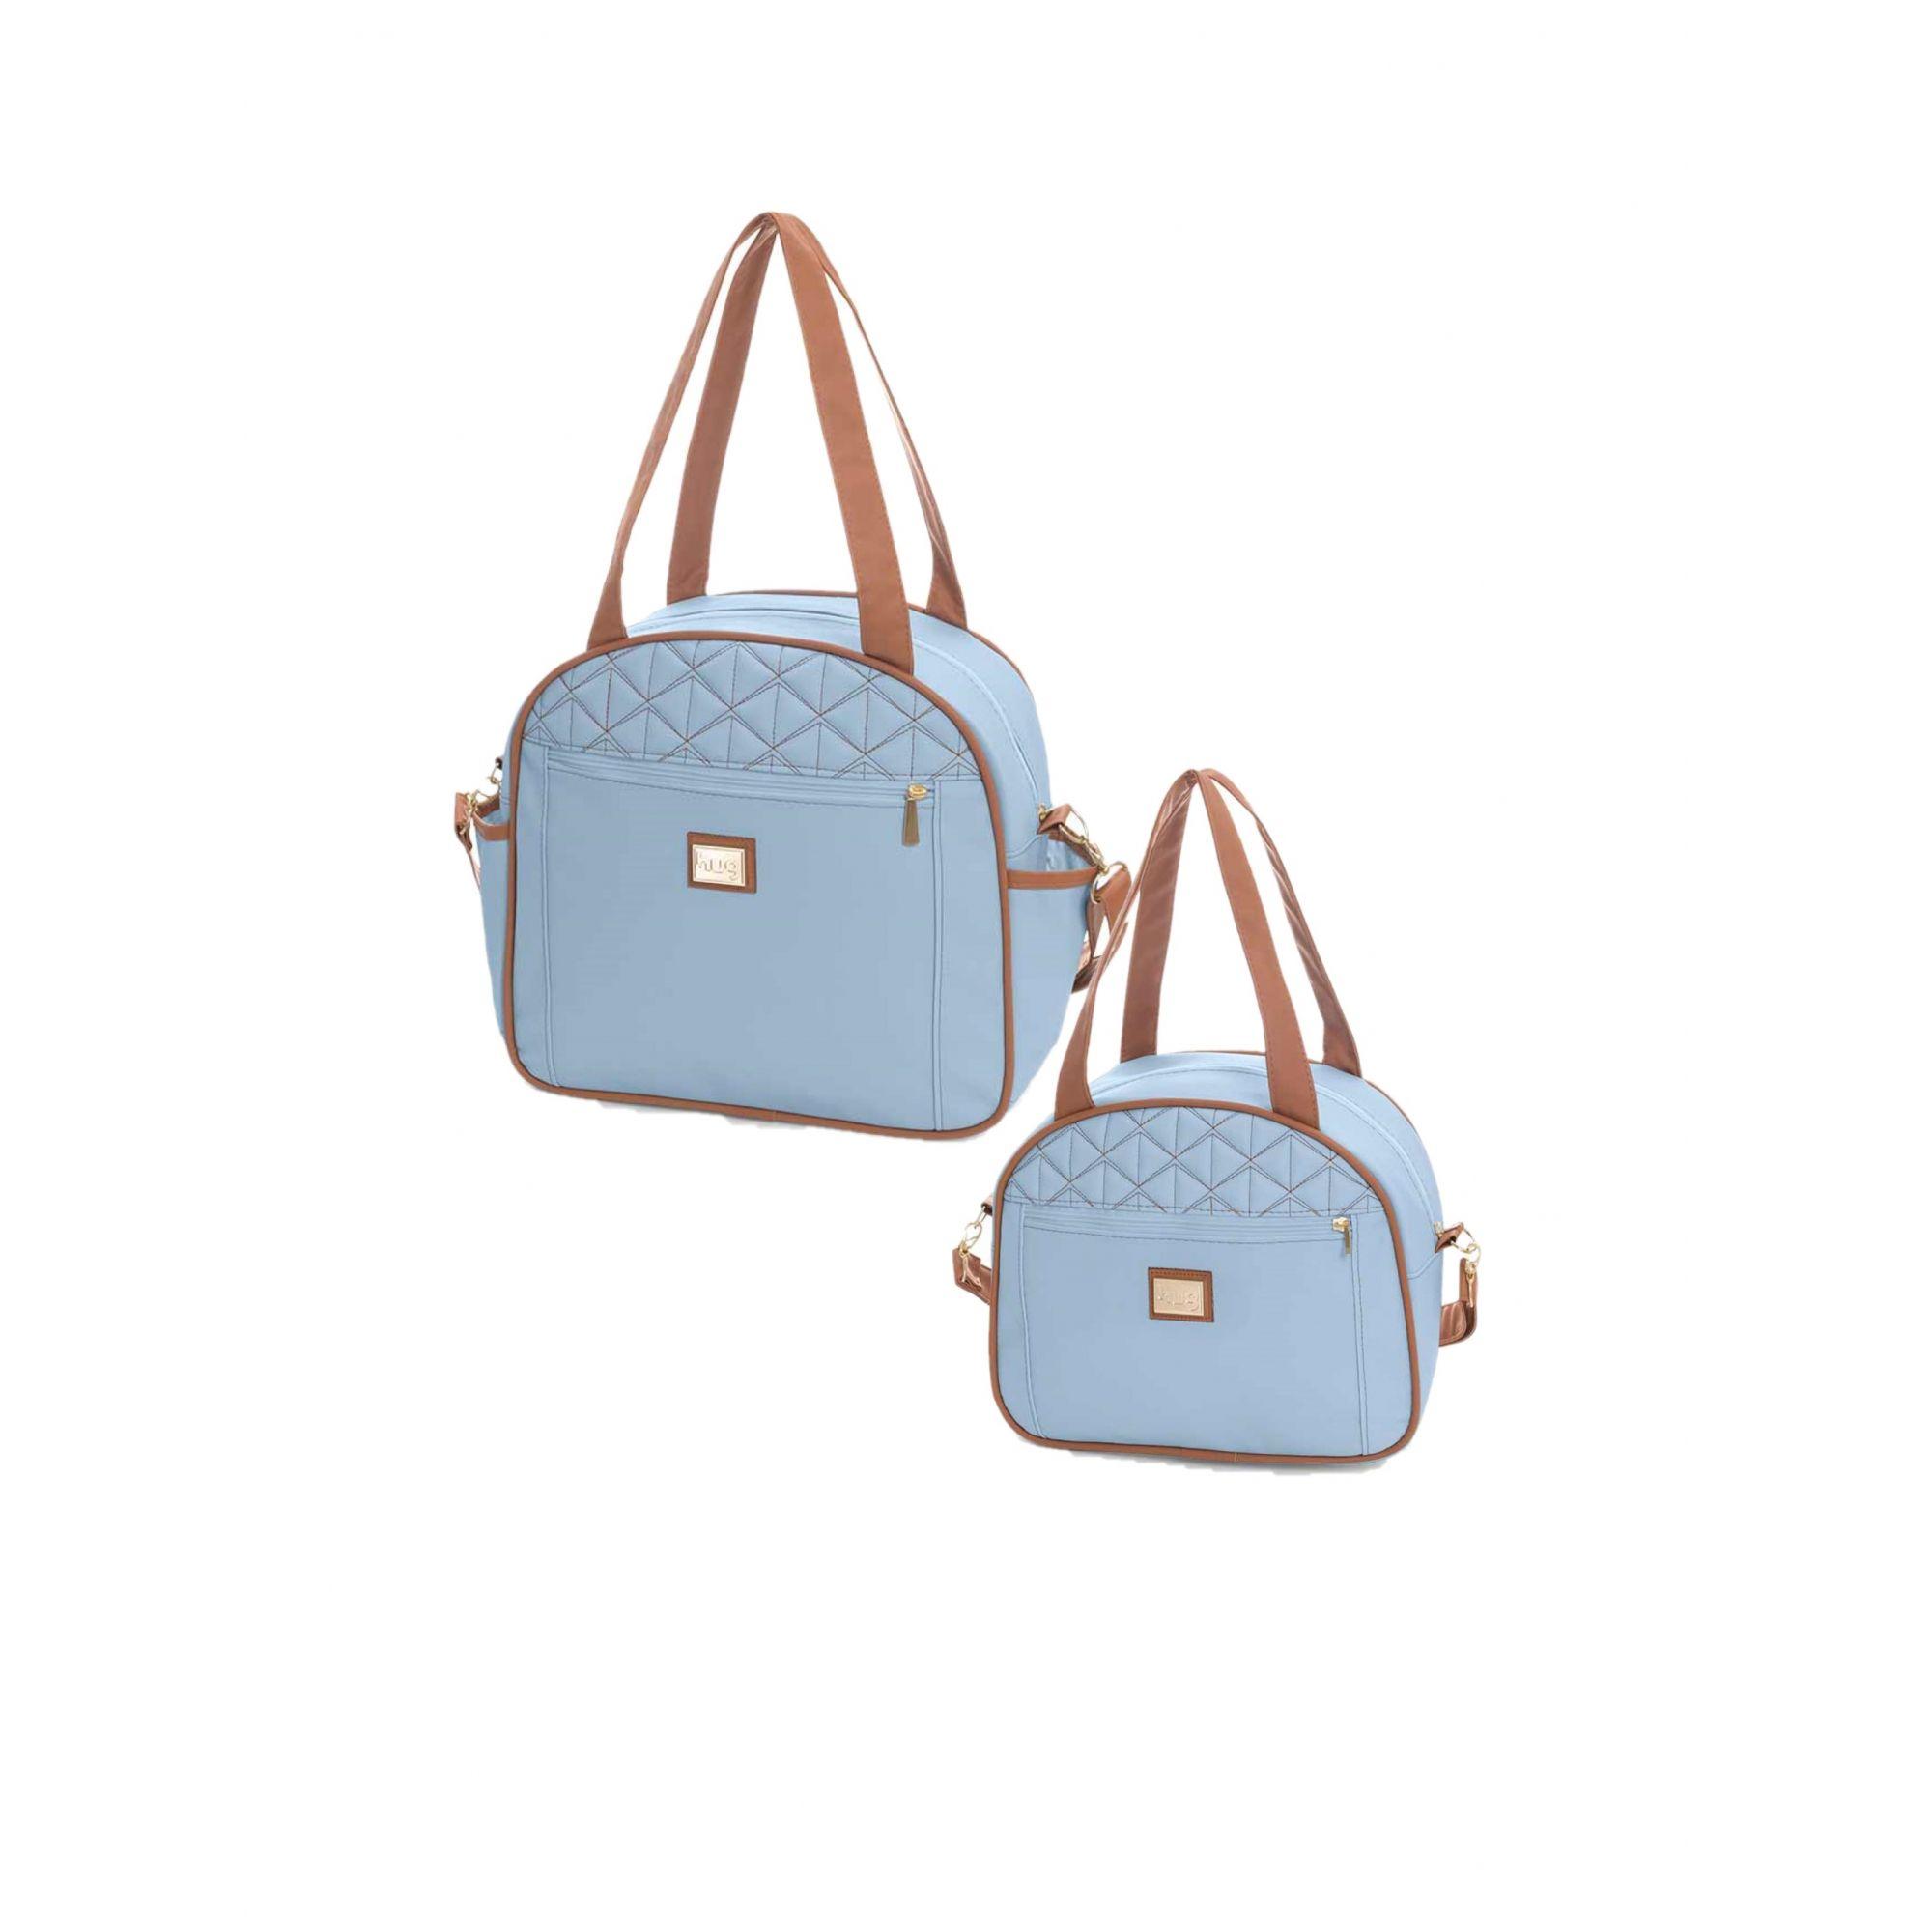 Kit Bolsa maternidade Bombom Azul Bebê - 2 pçs - Hug